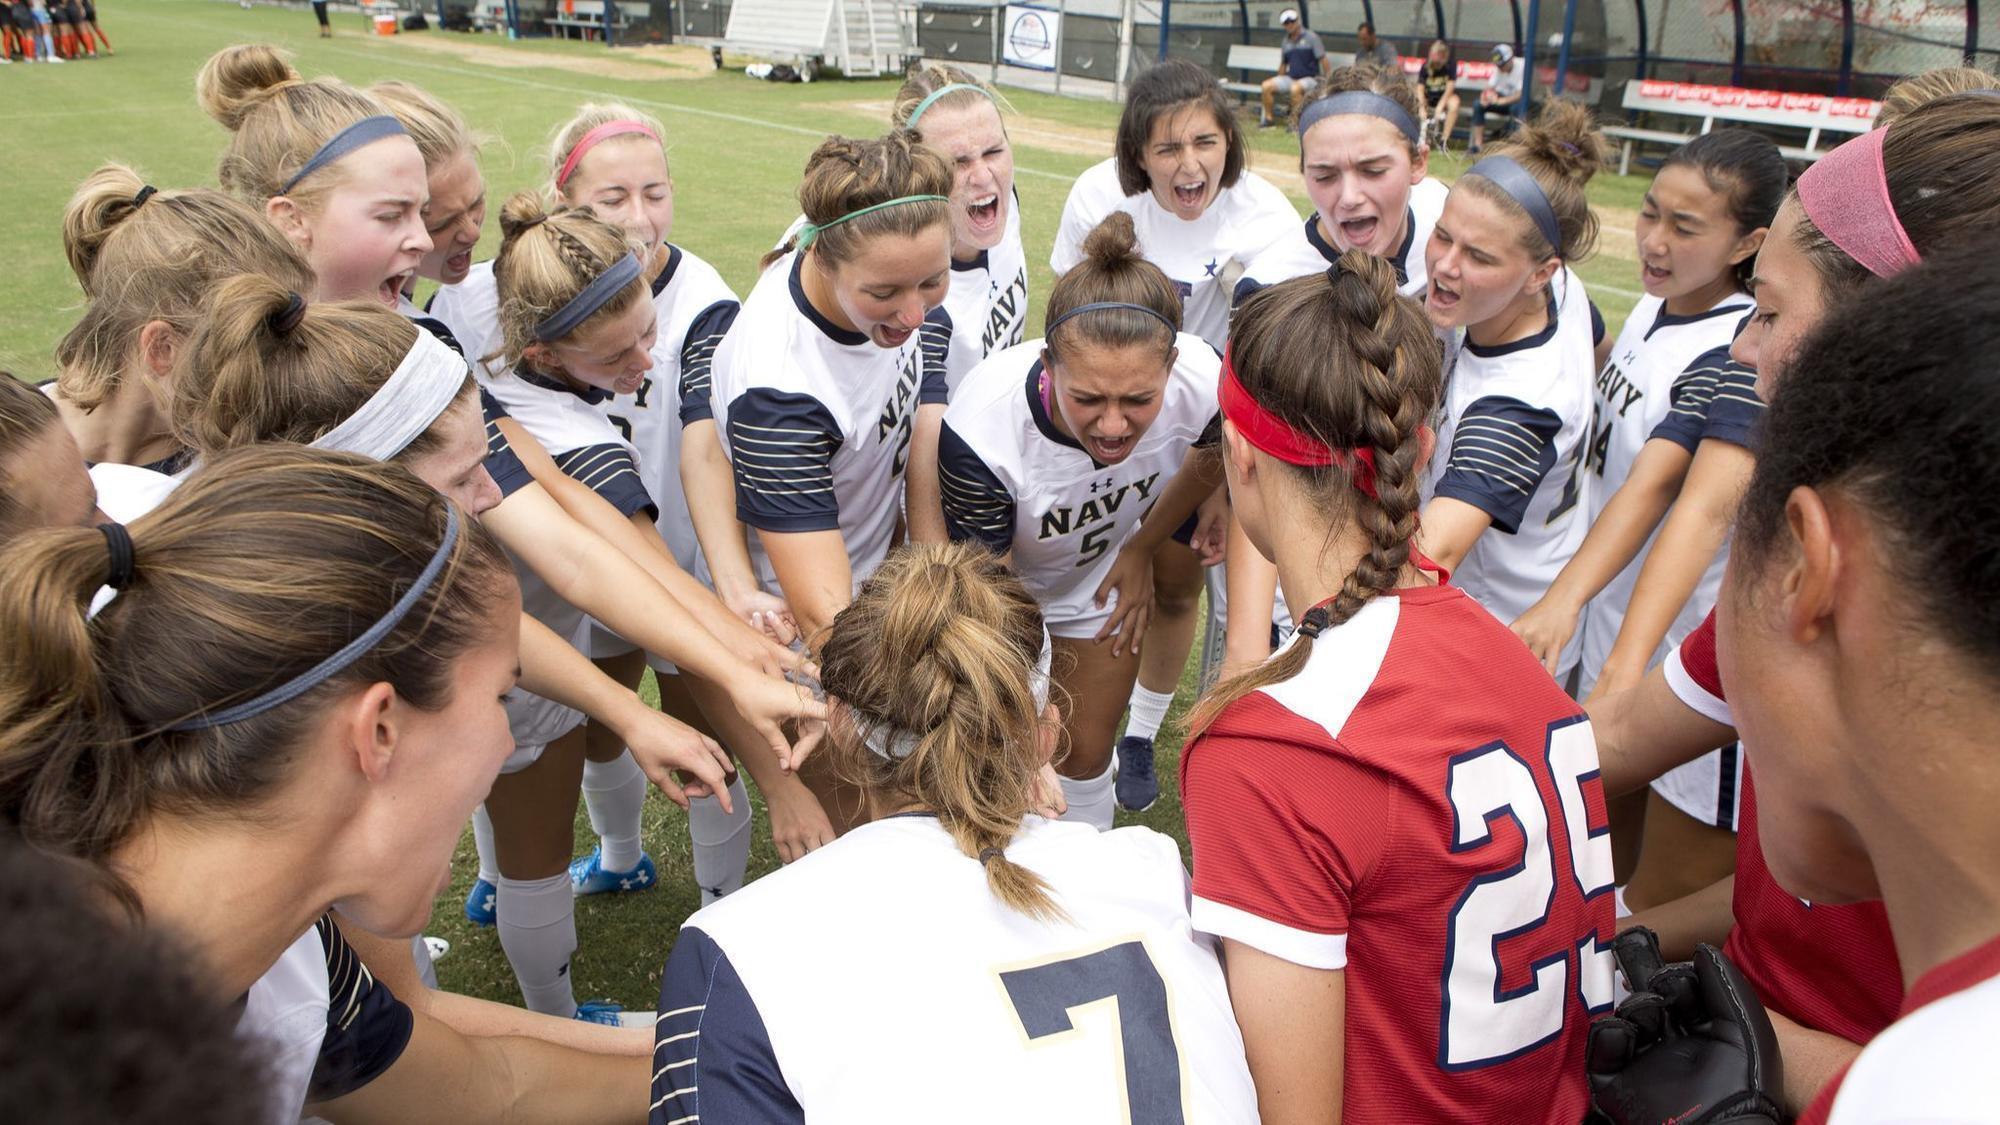 College roundup: Higginson's goal lifts Navy women's soccer